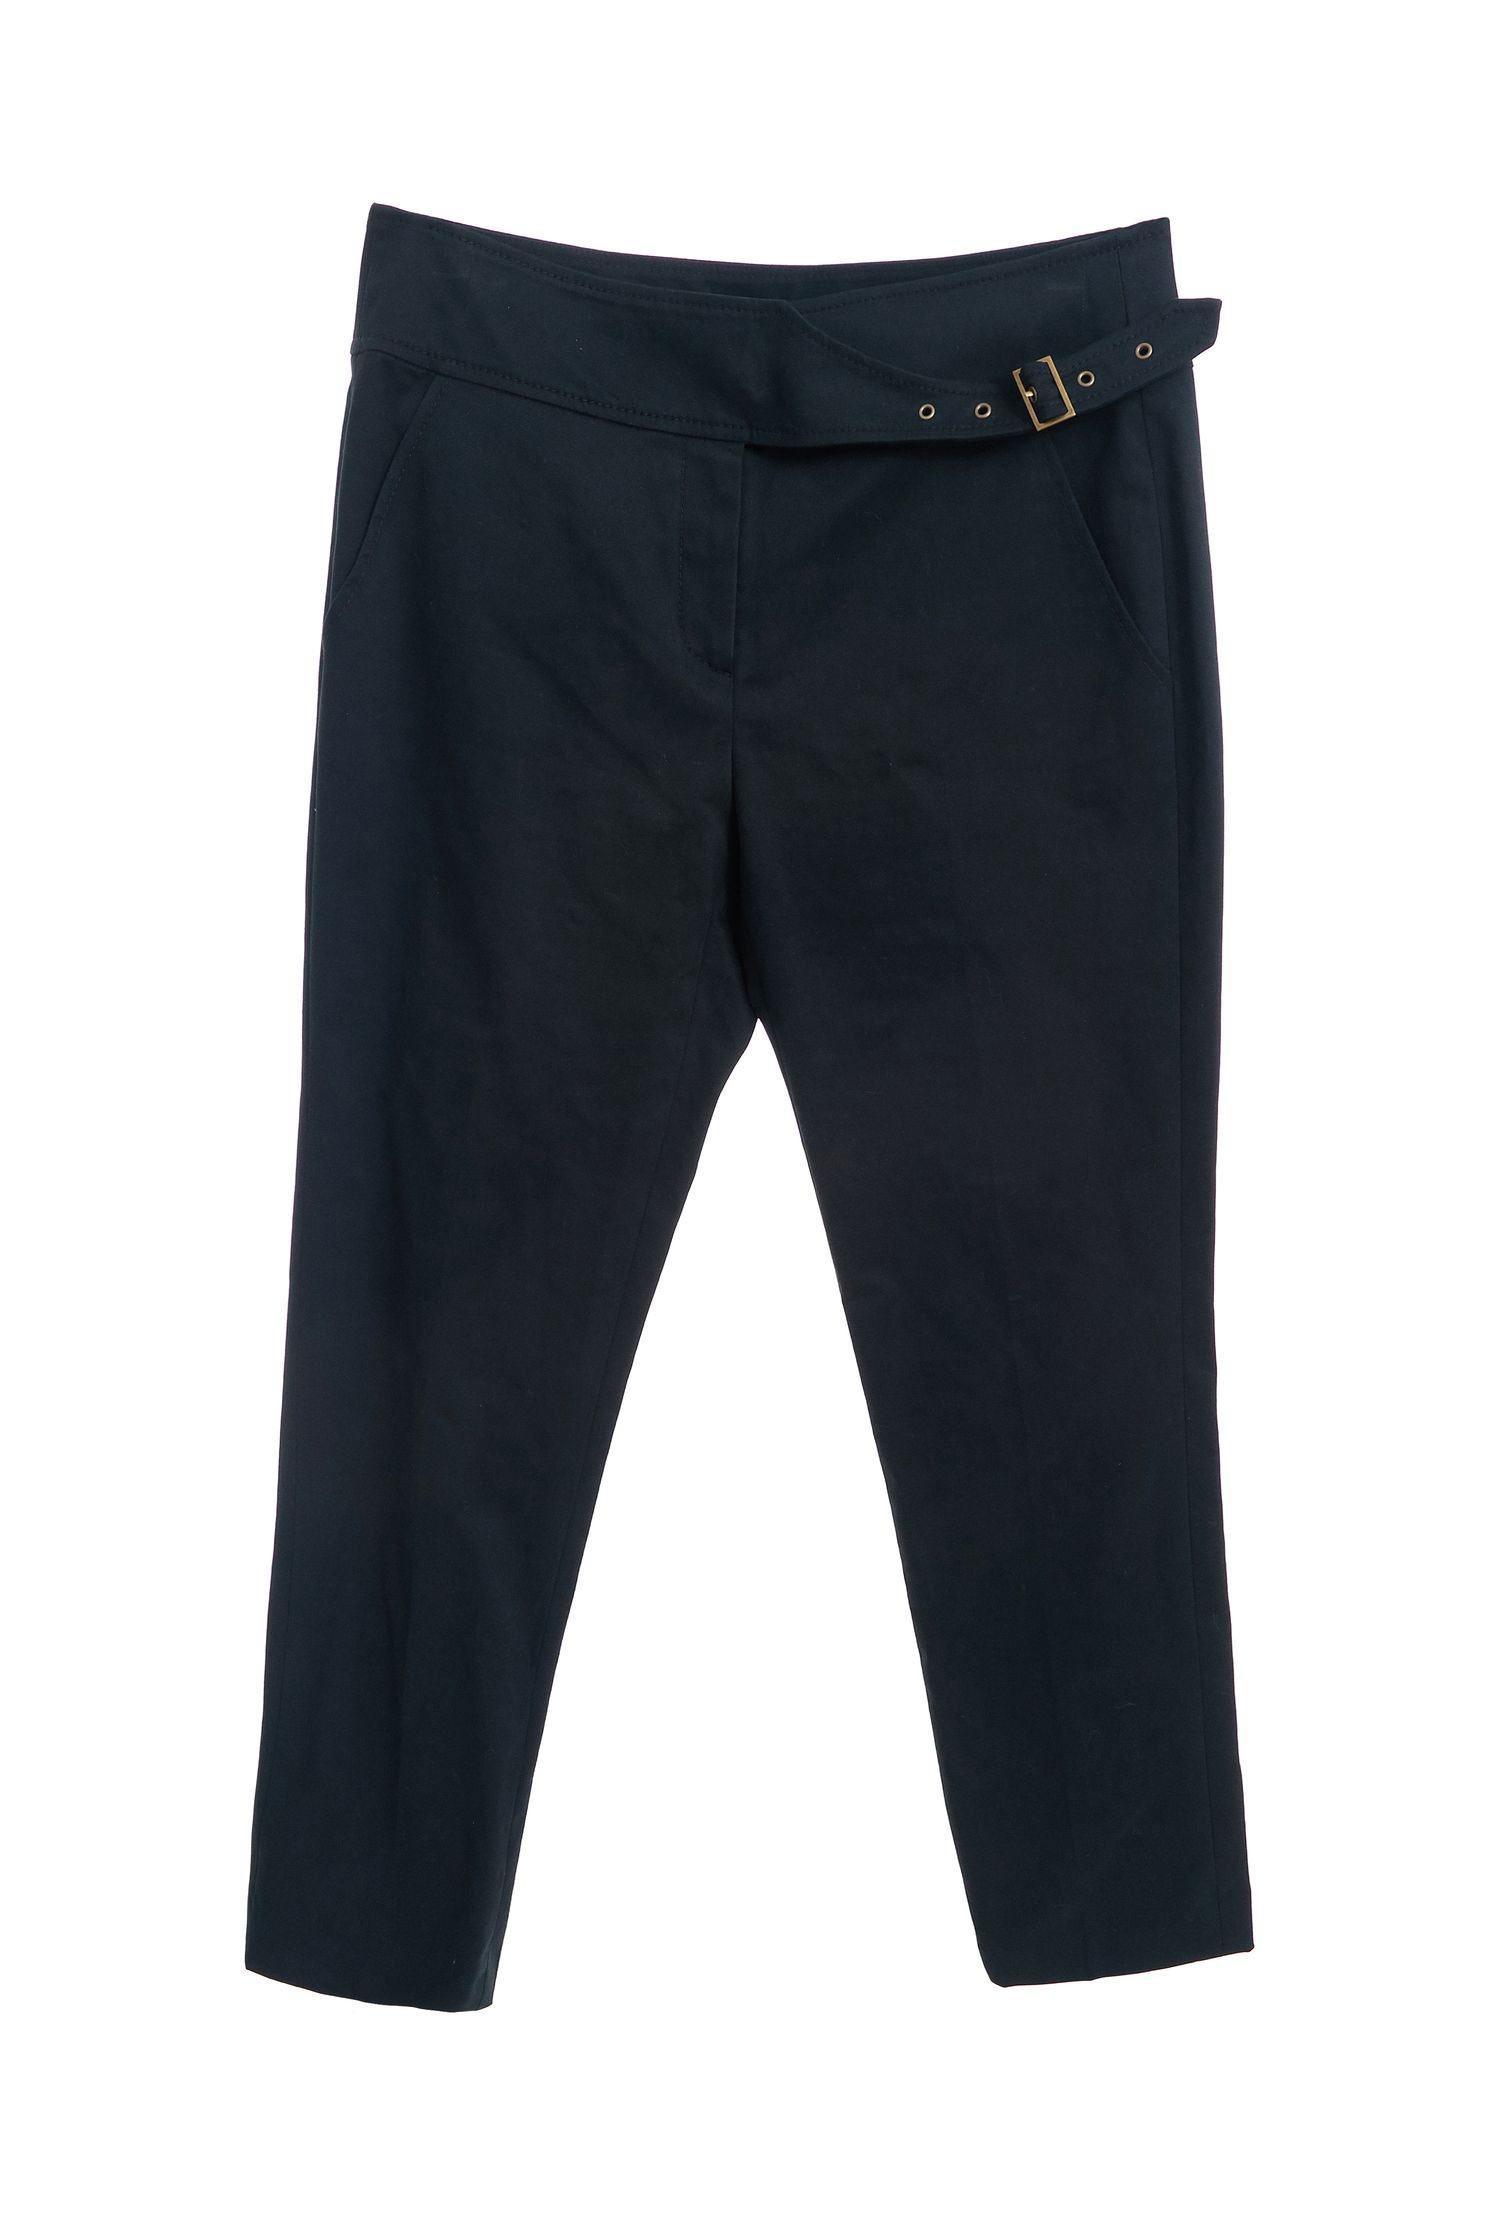 Ink-green narrow cropped pants,skinnypants,pants,pants,thinpants